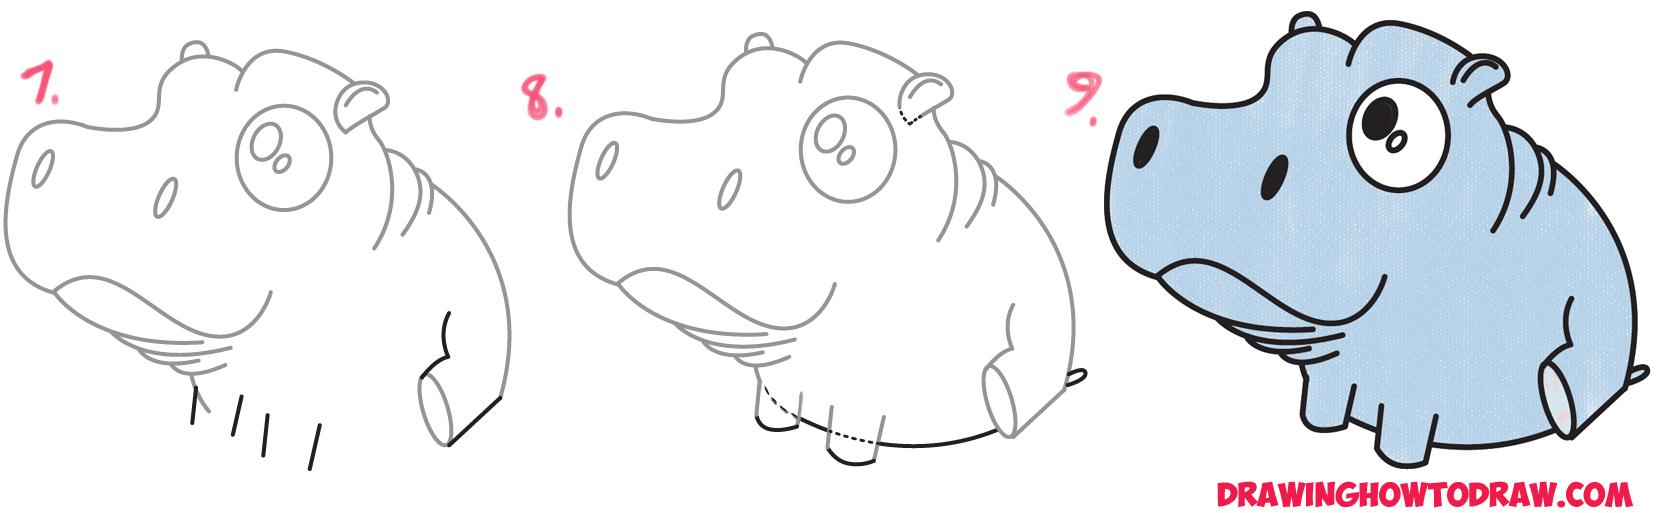 Learn How To Draw A Cute Baby Hippo Cartoon Kawaii Chibi Simple